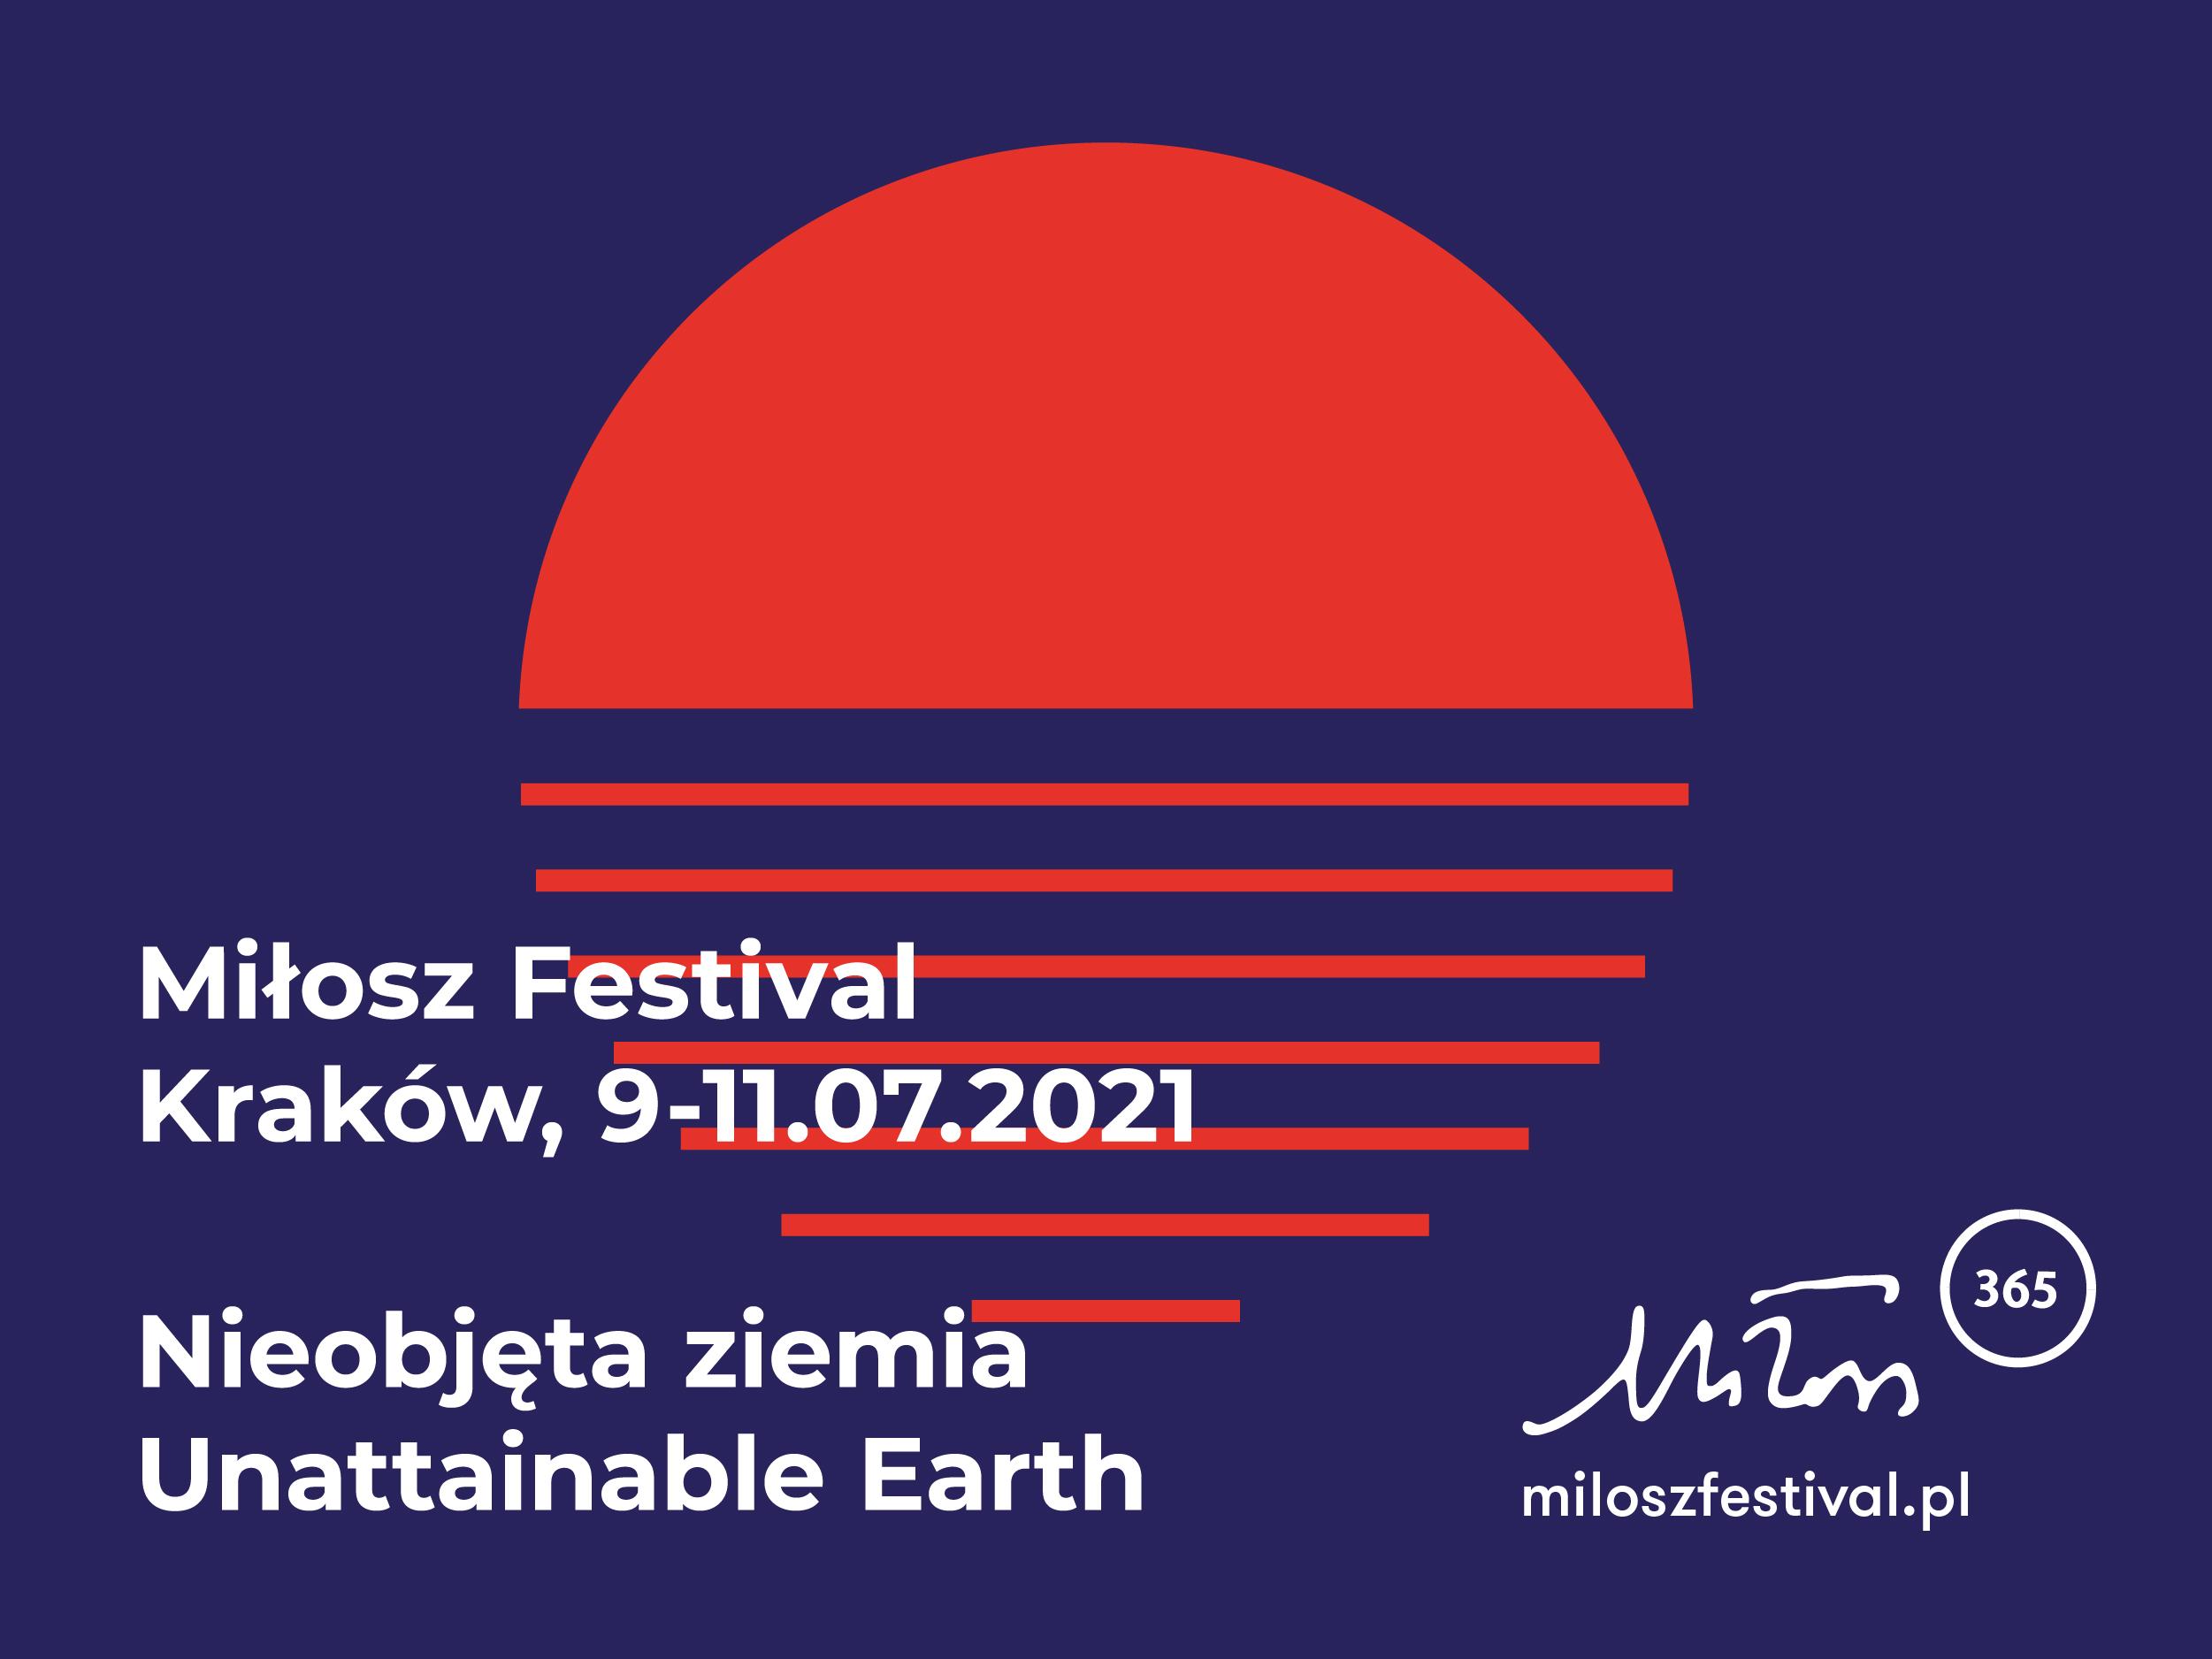 festiwal miłosza